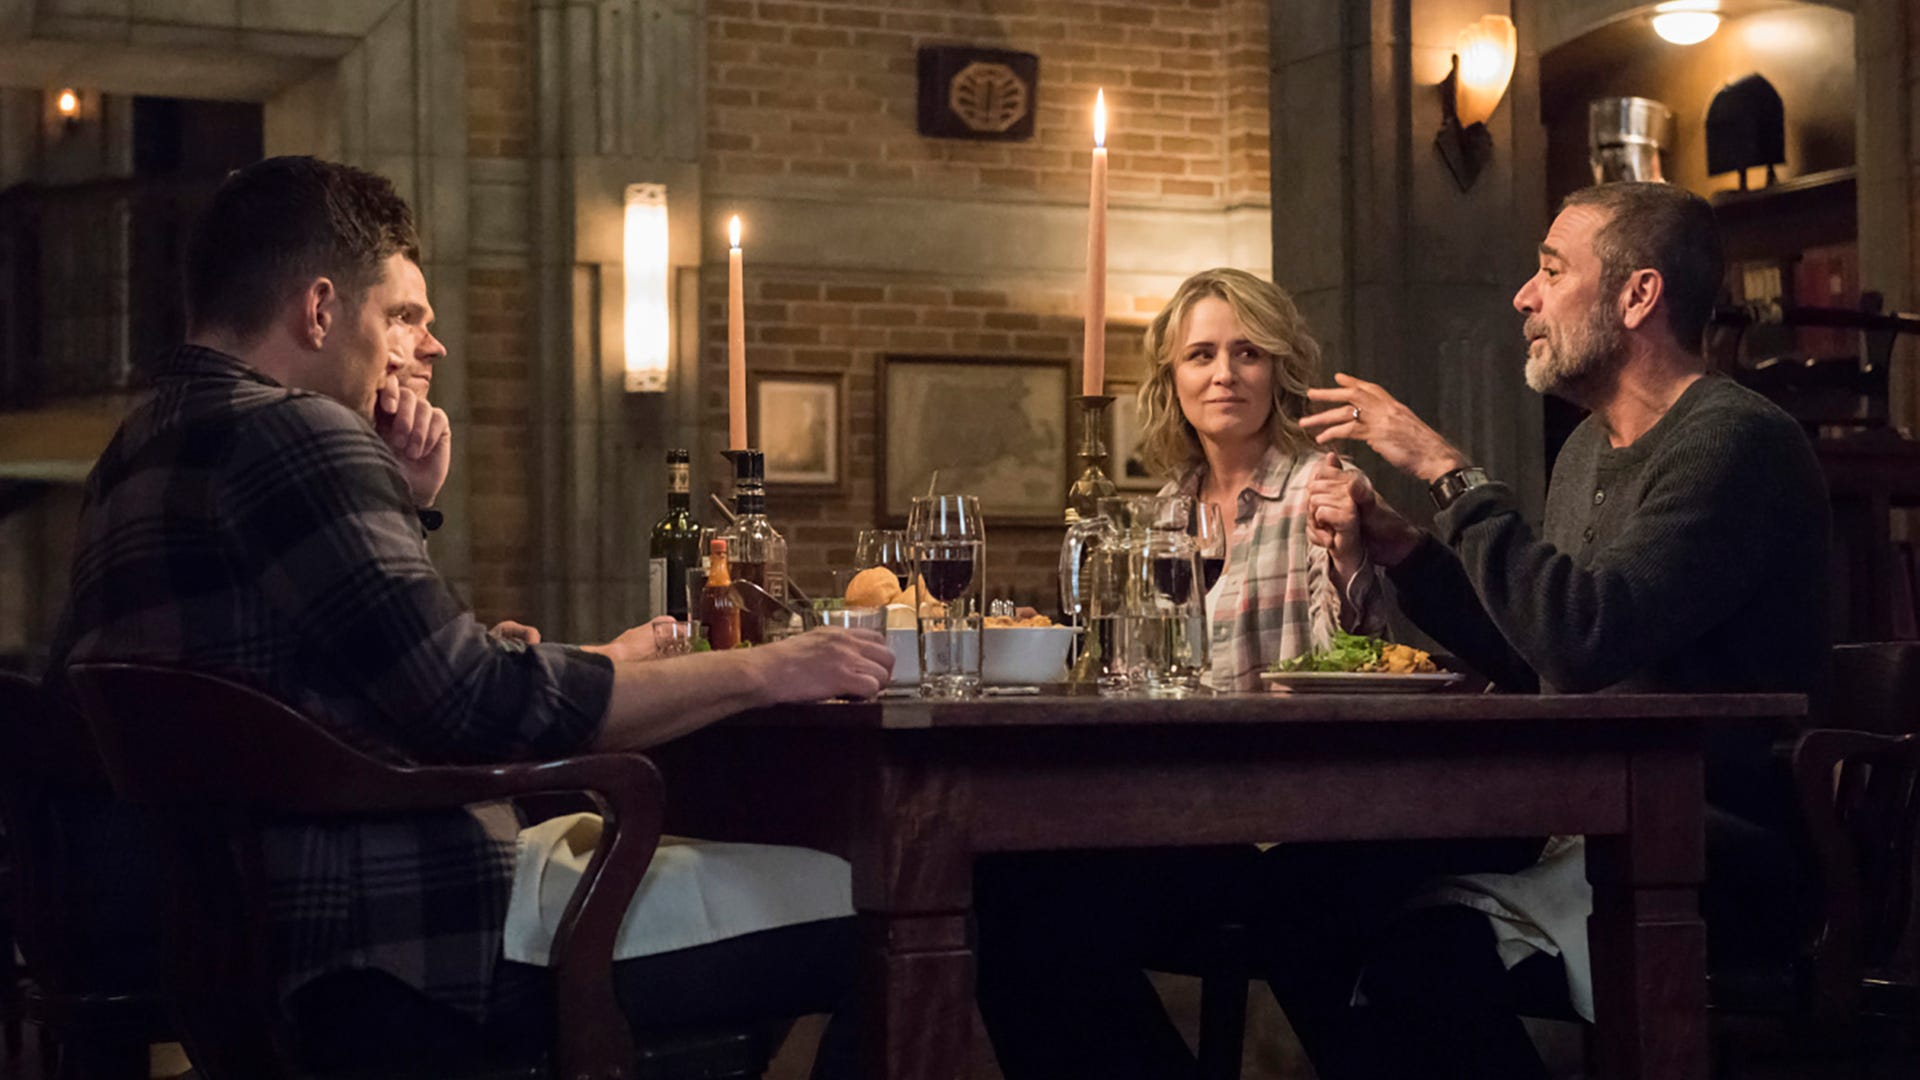 Jensen Ackles, Jared Padalecki, Samantha Smith and Jeffrey Dean Morgan, Supernatural